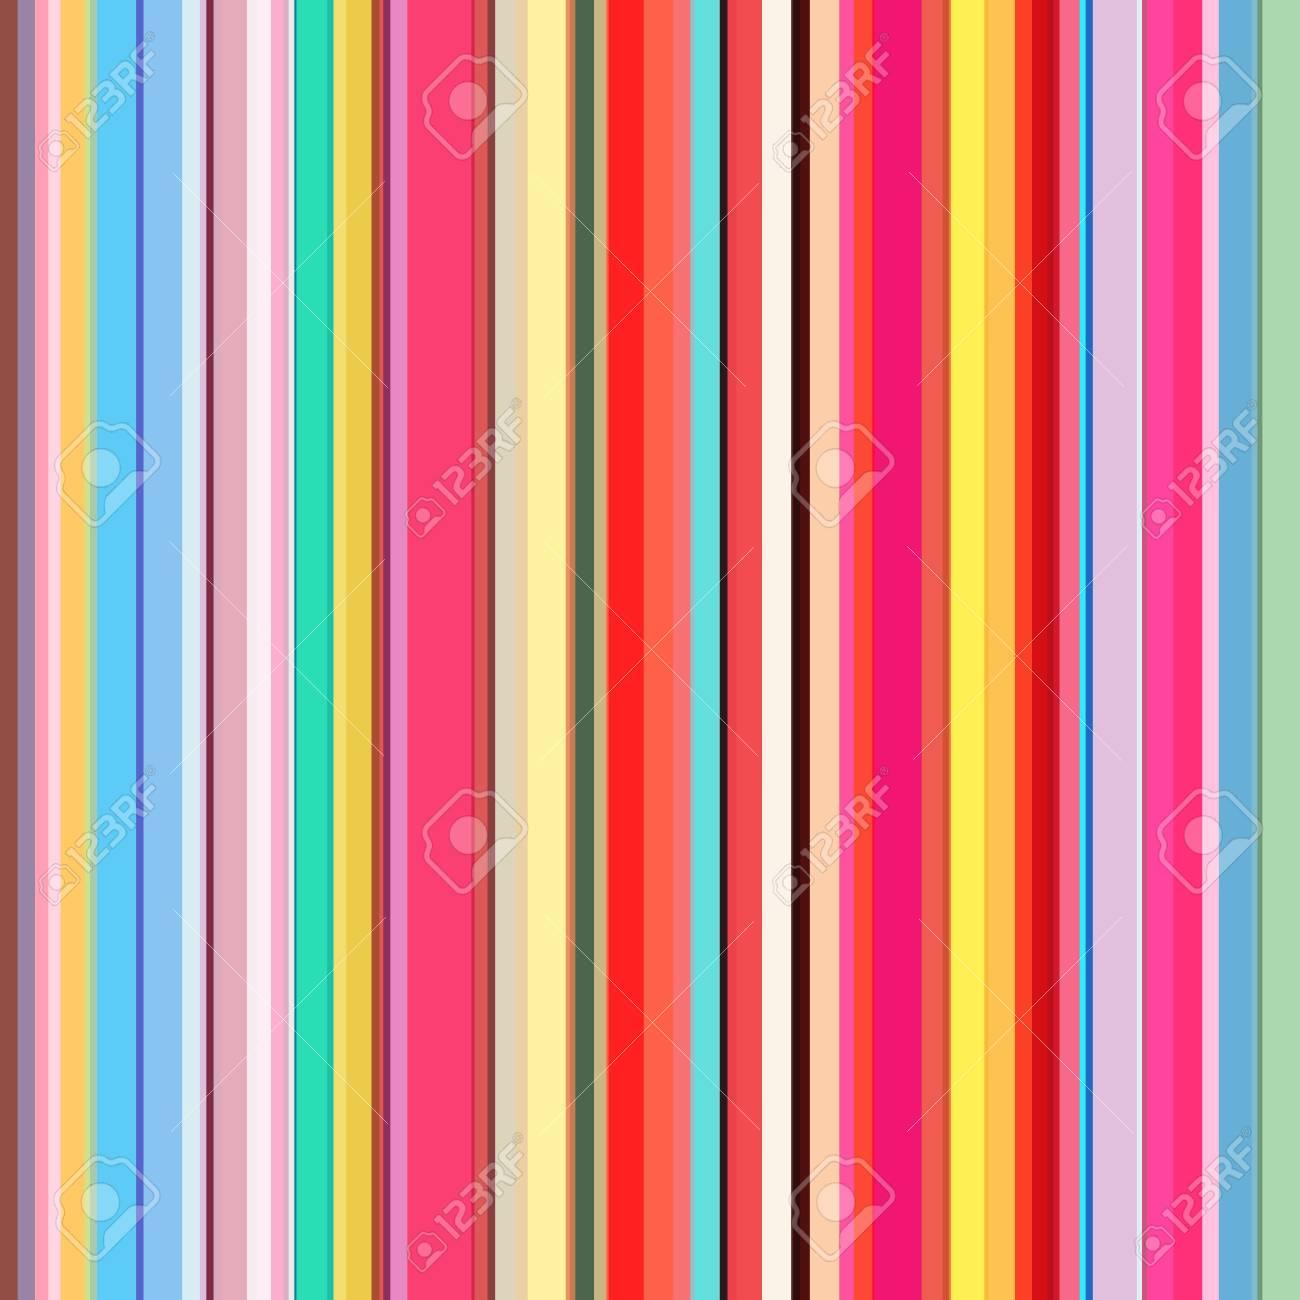 Color lines background  Colorful stripes designed for magazine,